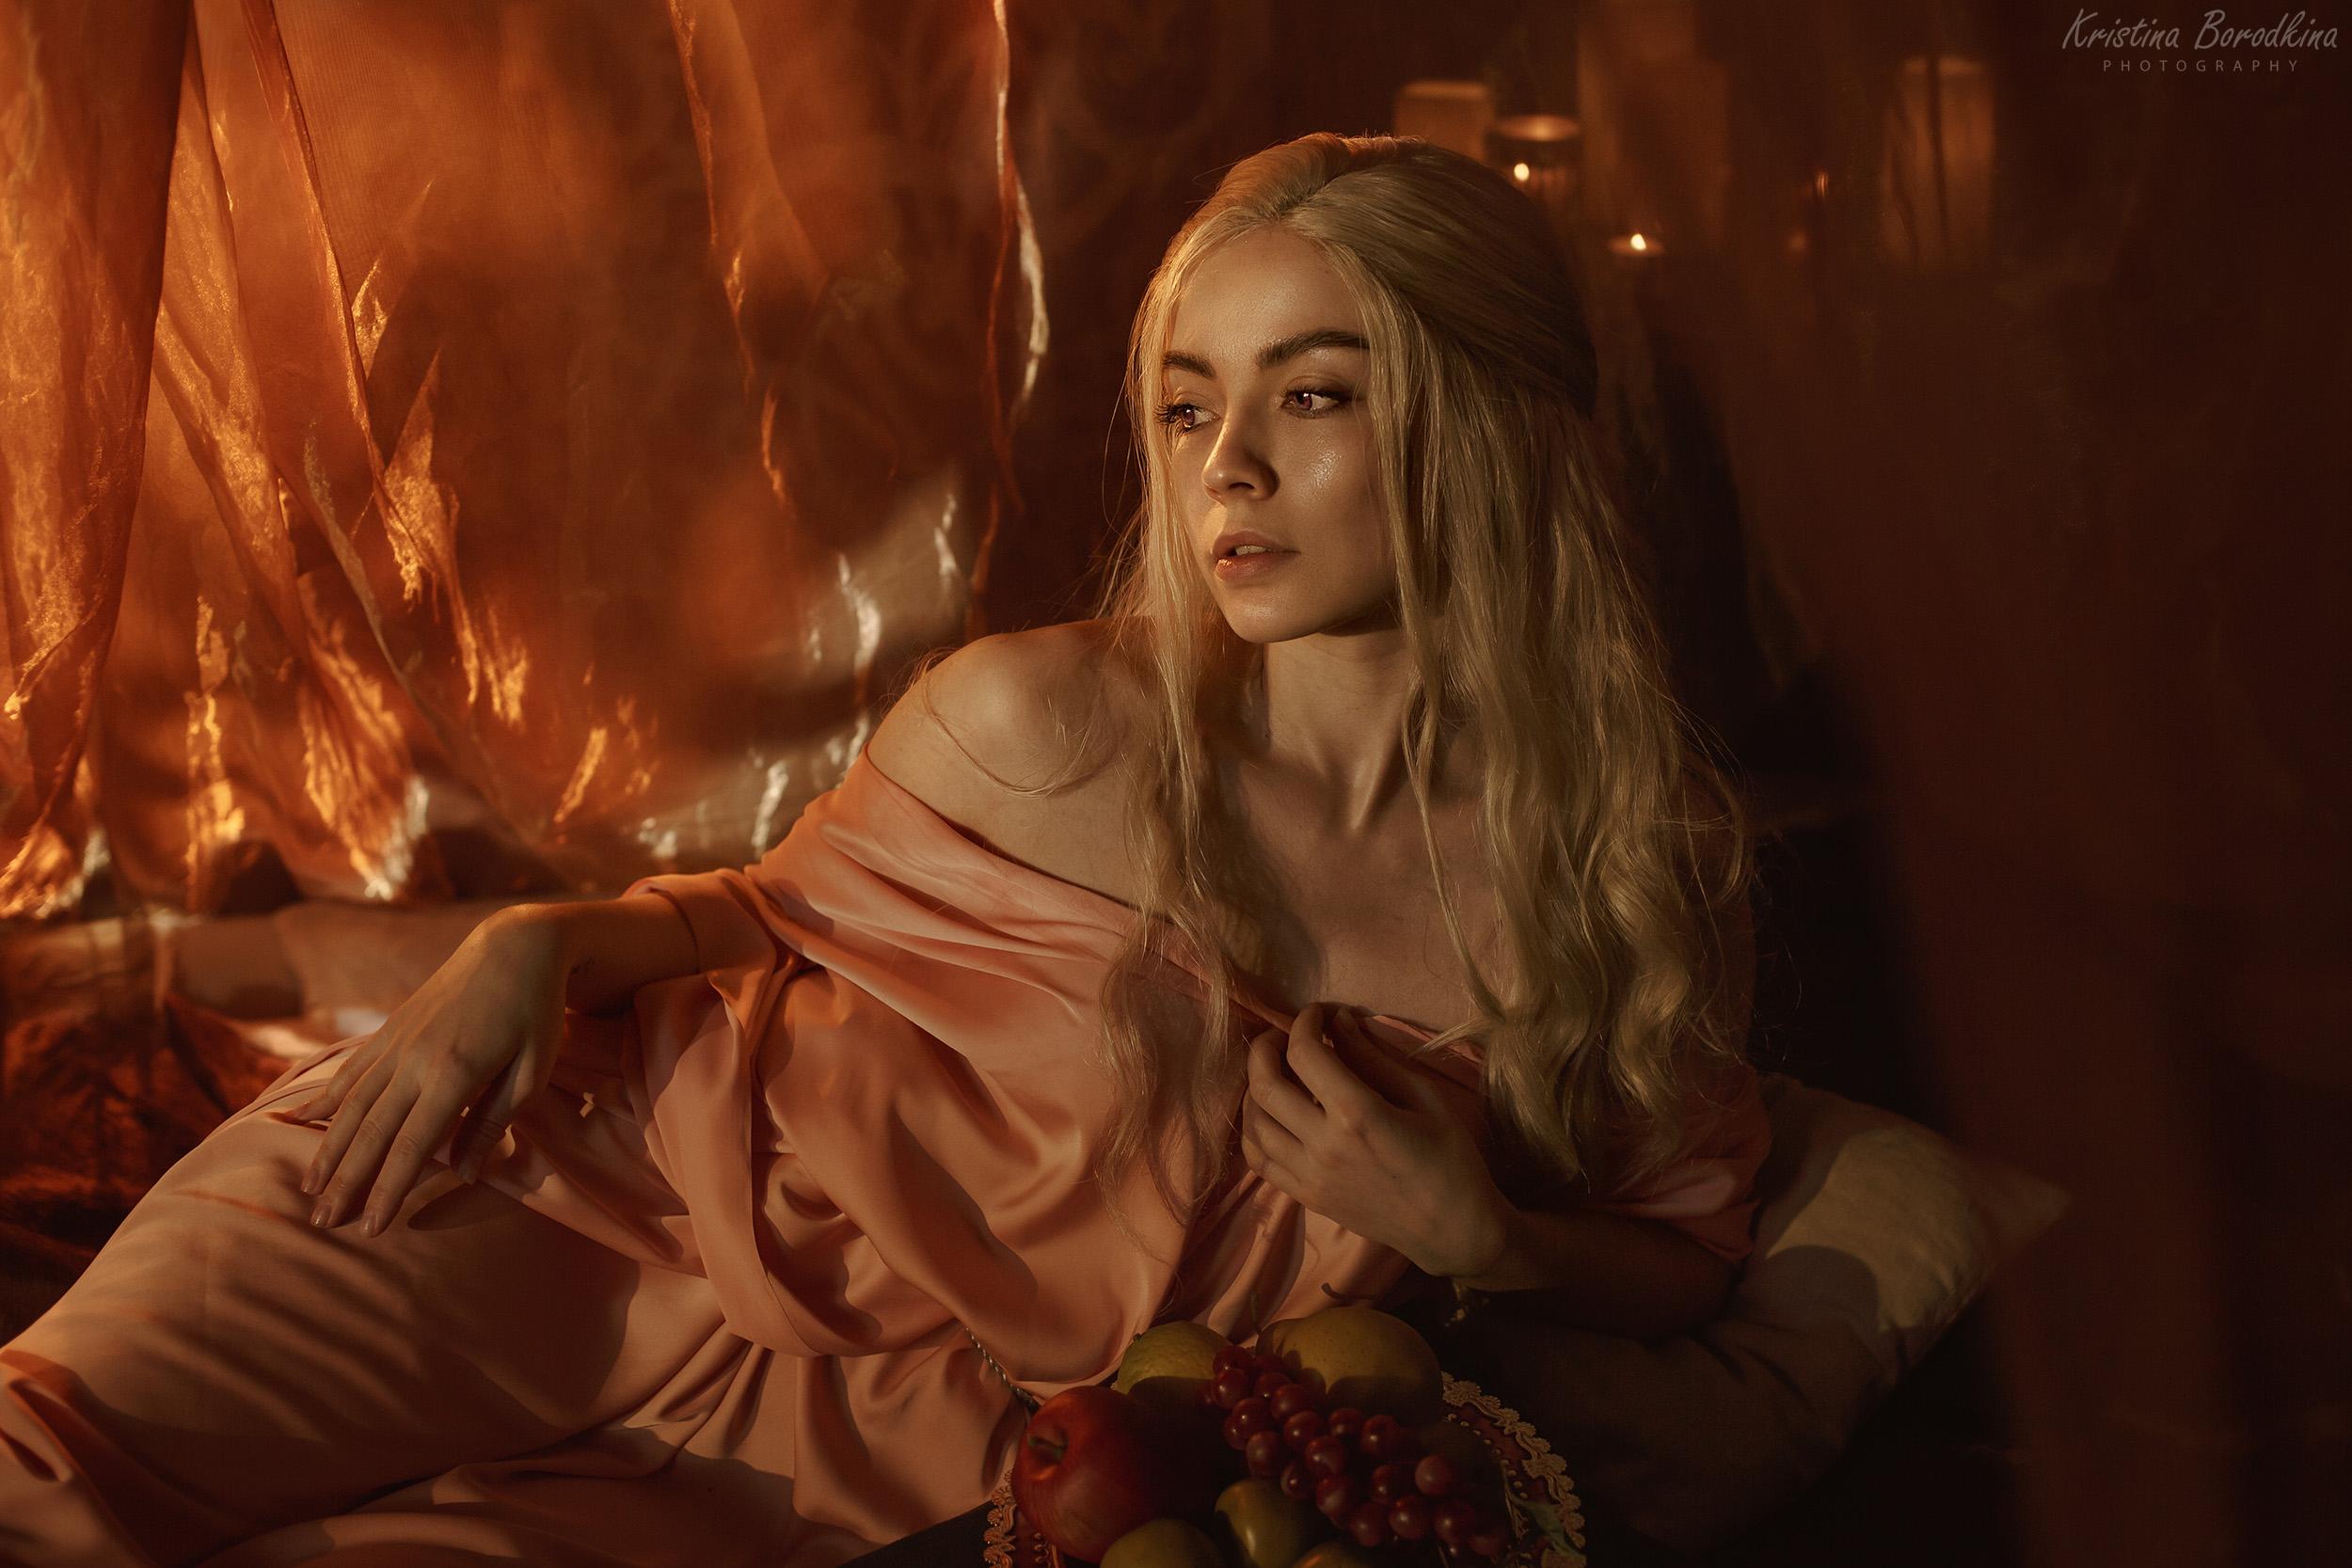 People 2500x1667 women blonde Daenerys Targaryen cosplay tent lingerie Kristina Borodkina